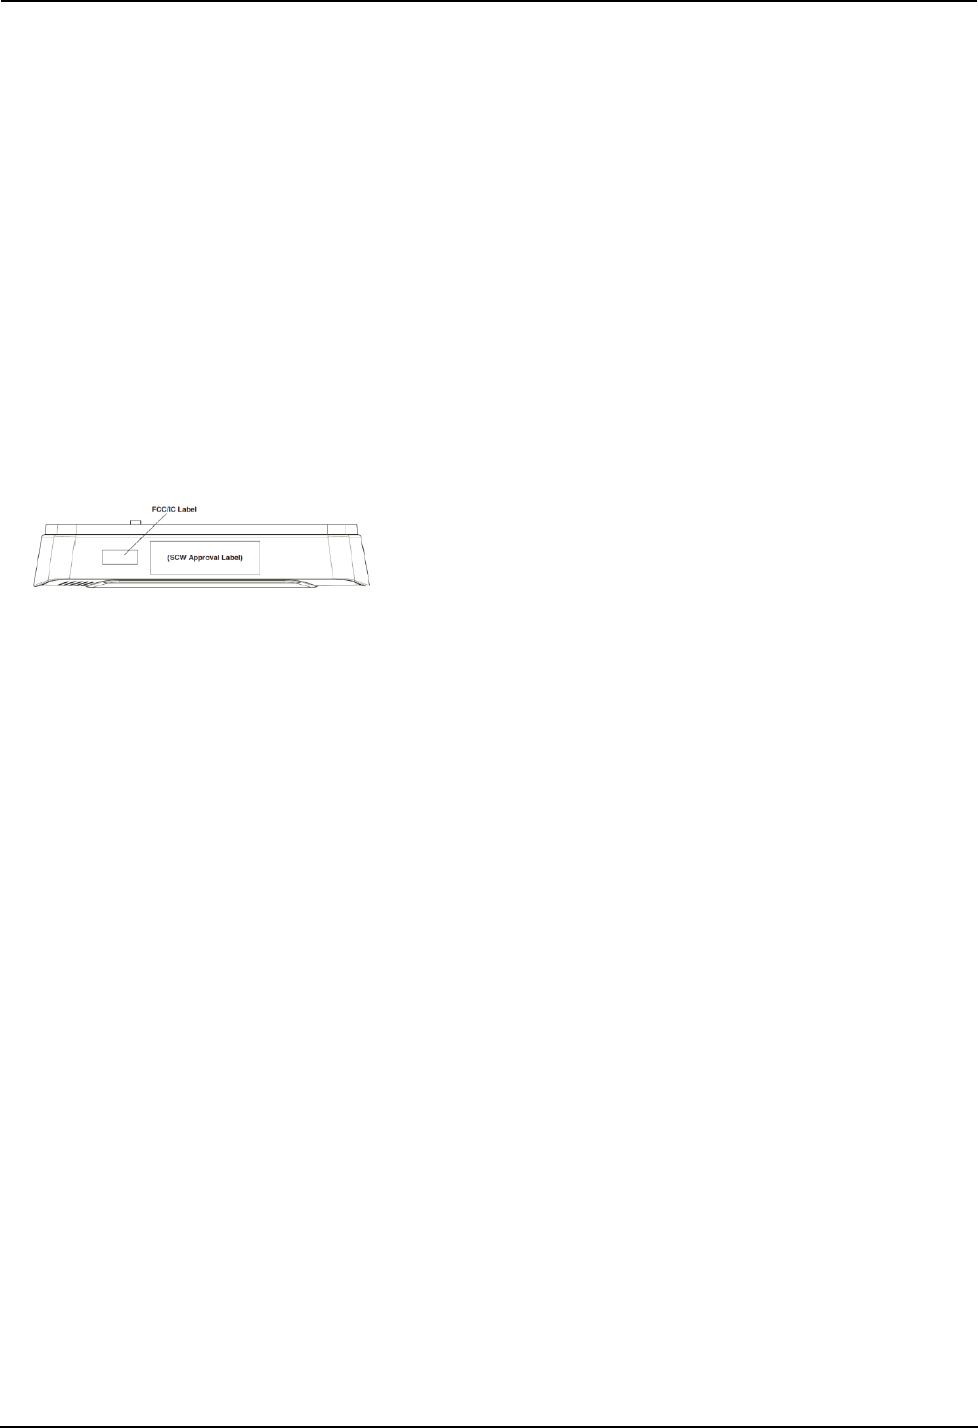 220EW8FB/00 Philips LCD Widescreen Monitor Dsc impassa